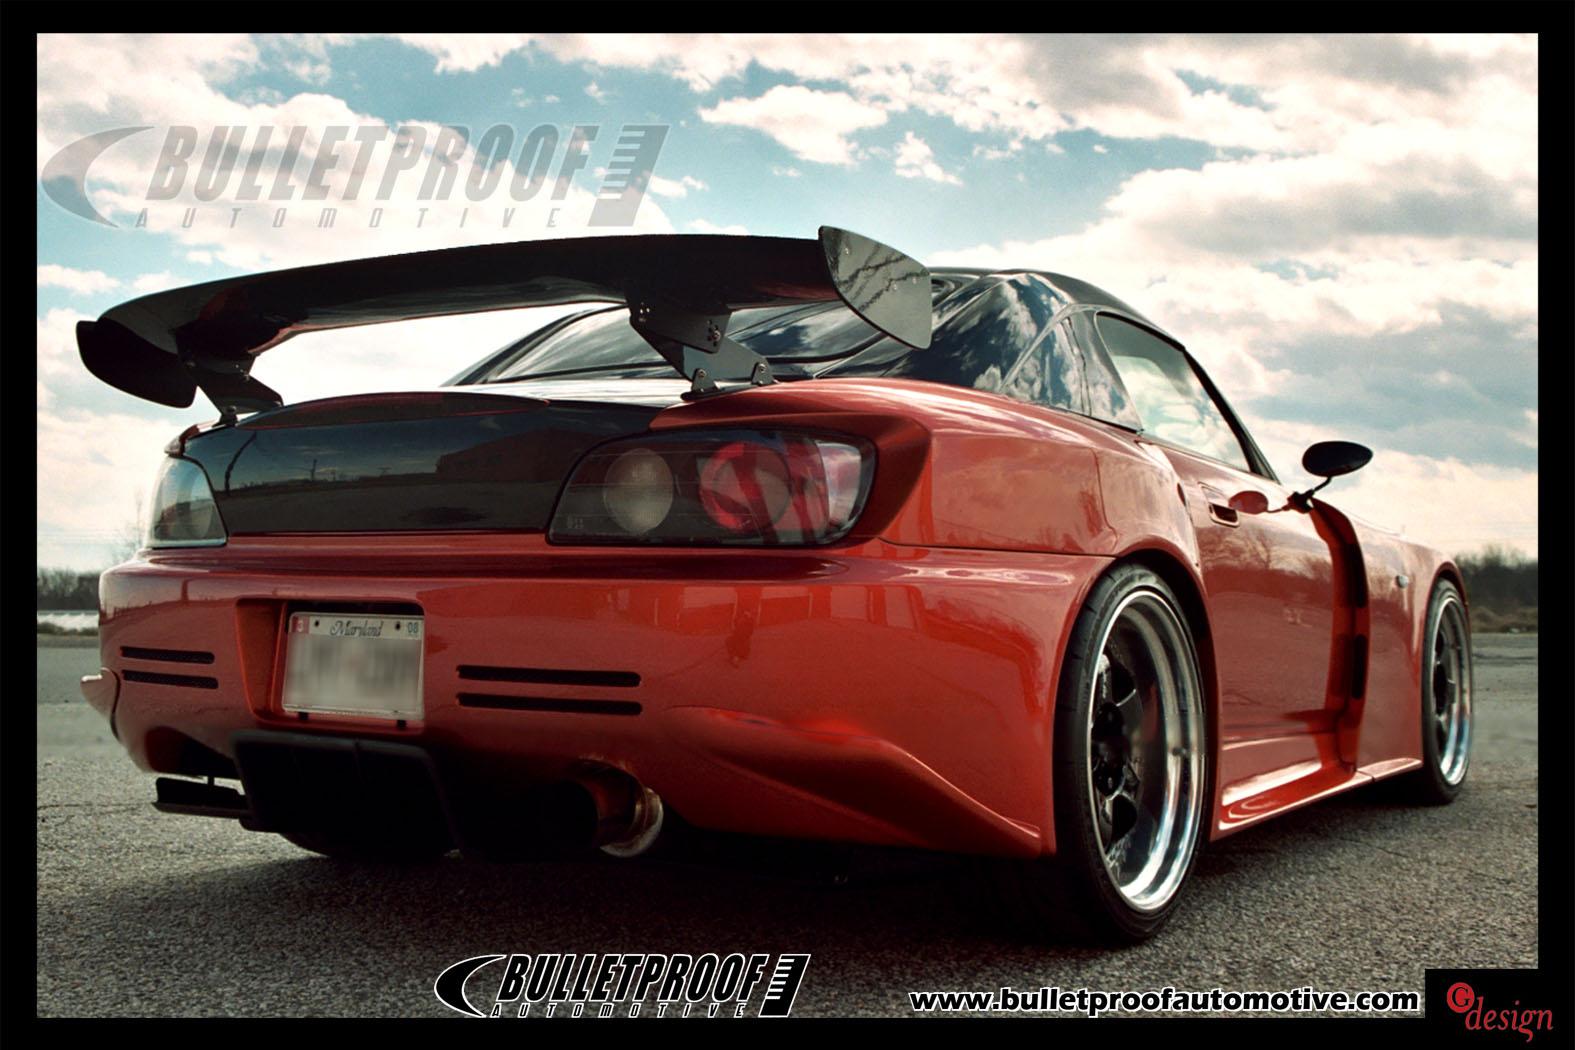 Honda S2000 Car Insurance Specialists - S2000 Insurance Brokers ...